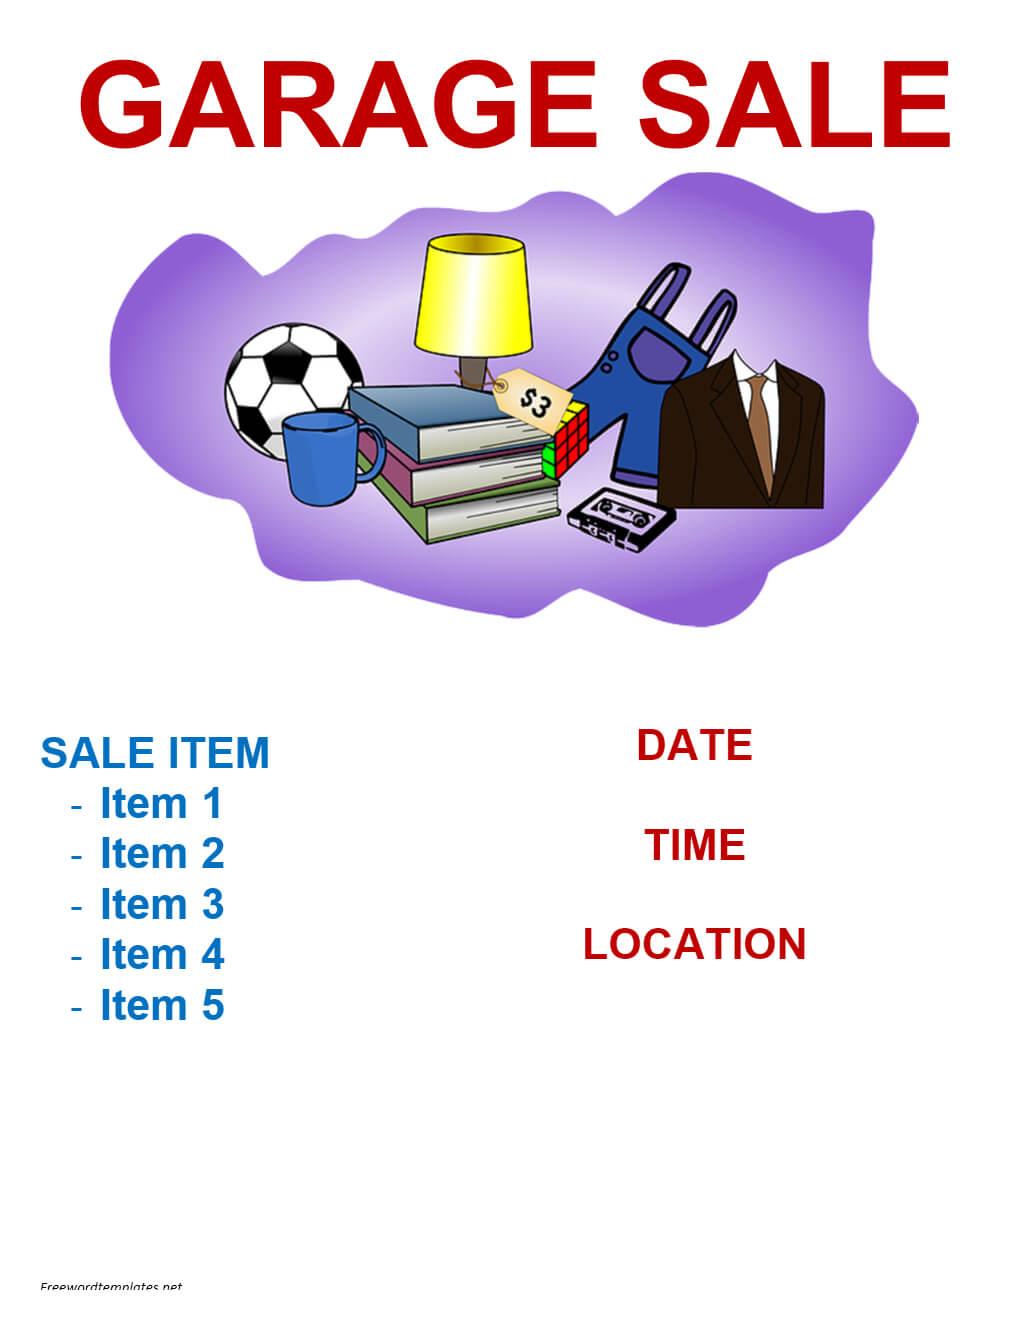 Garage Sale Flyer Template | Freewordtemplates For Garage Sale Flyer Template Word